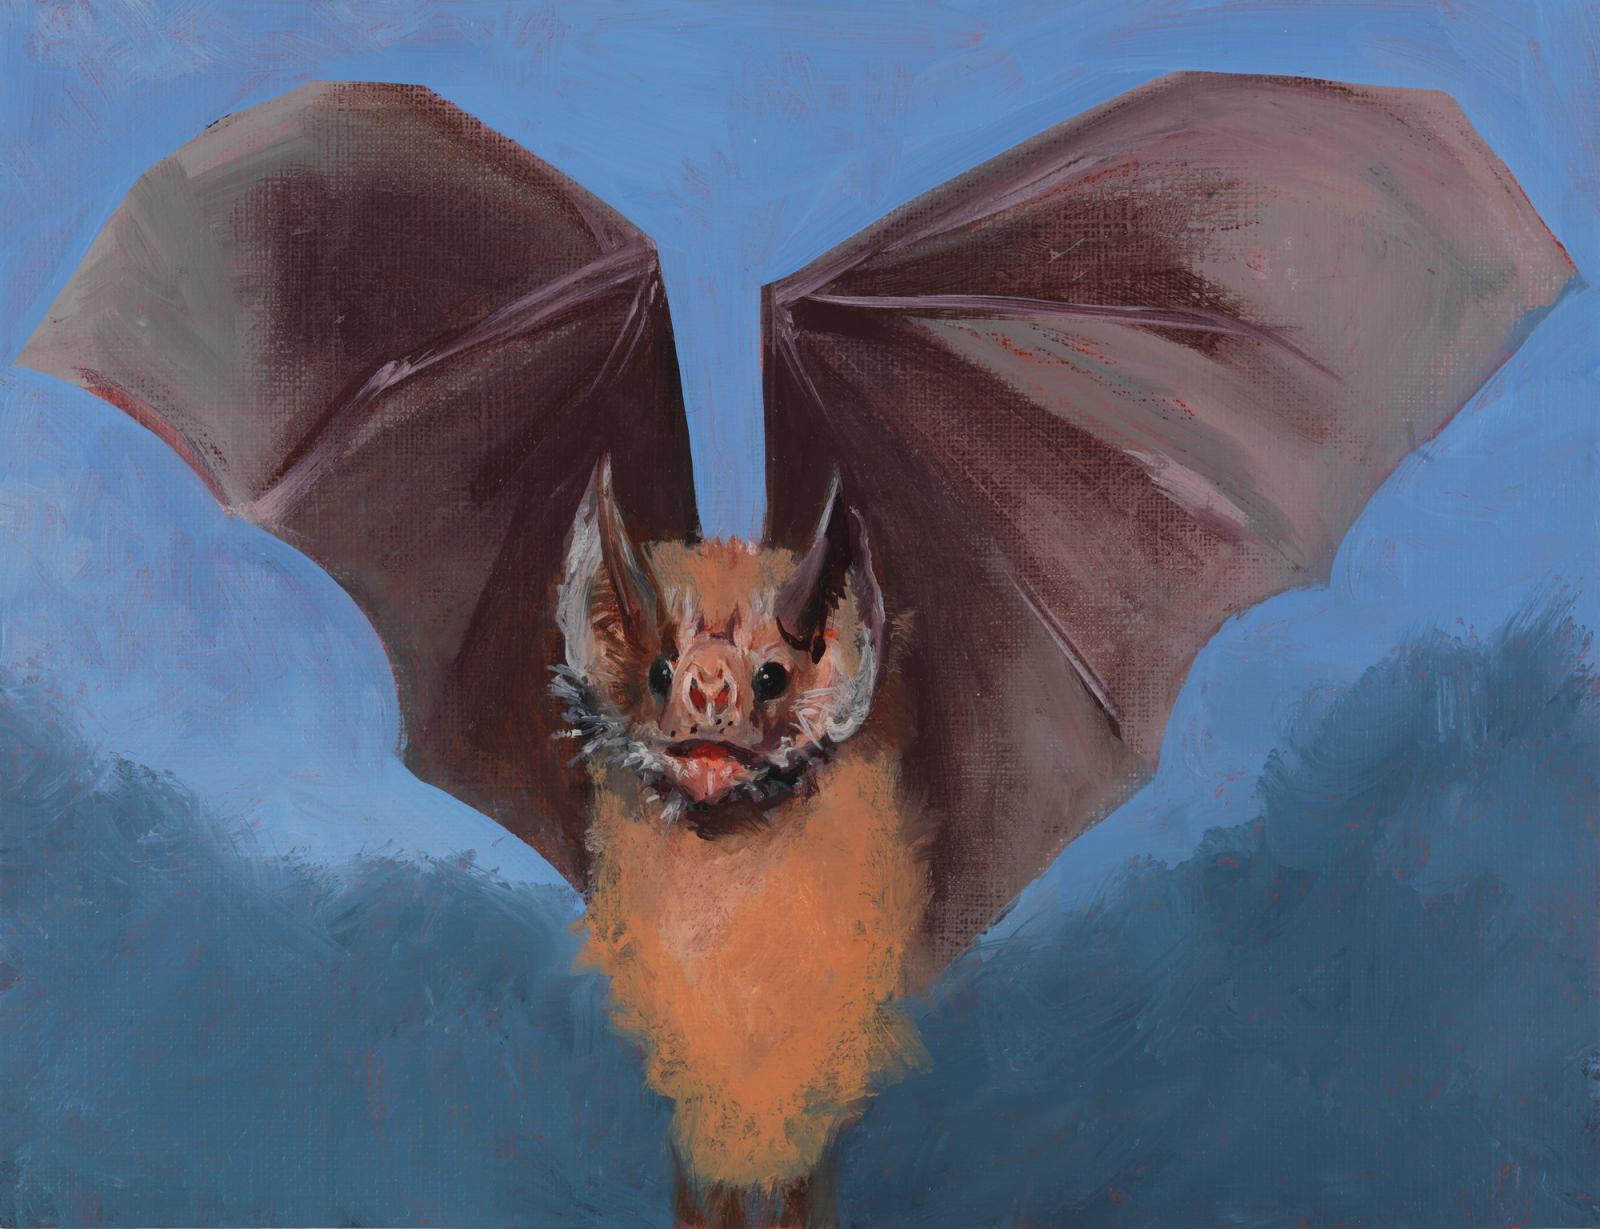 Marvin Gaye Chetwynd /Bat Opera/, 2014 Oil on paper,15.5 x 20.5 cm Photo: Alessandro Zambianchi.Courtesy Massimo De Carlo, Milano/London/Hong  Kong